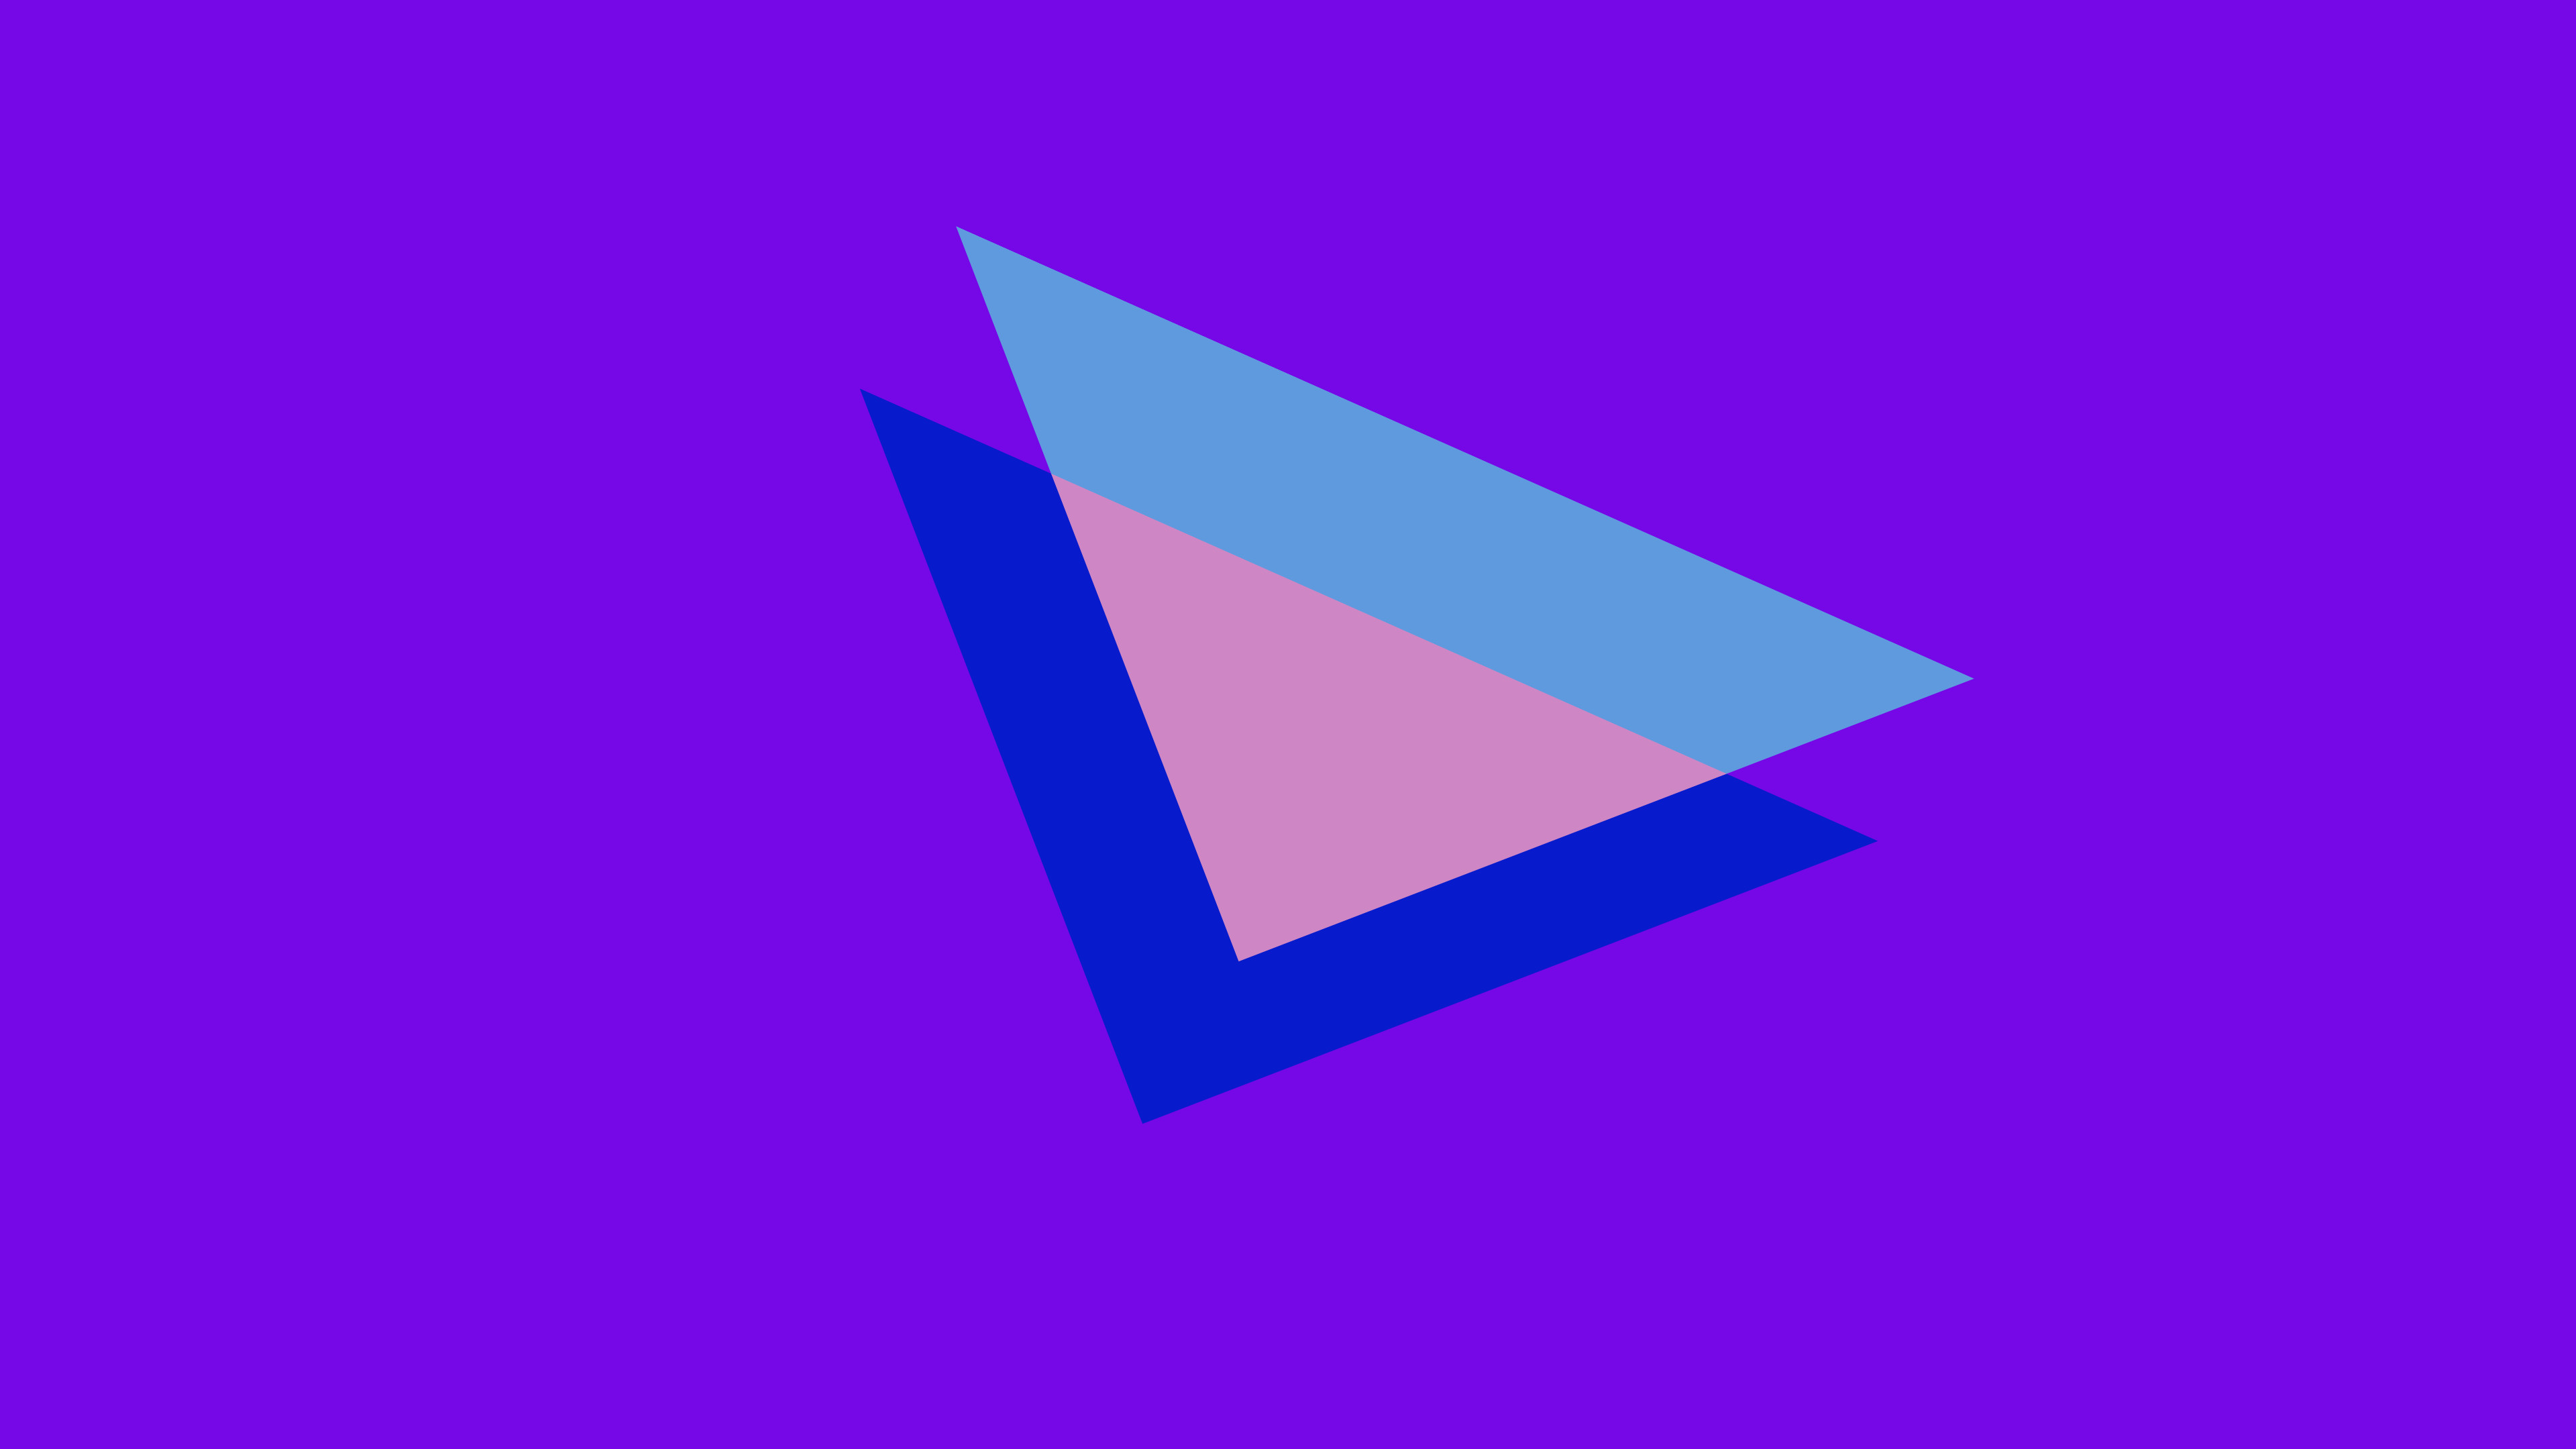 80s Triangles